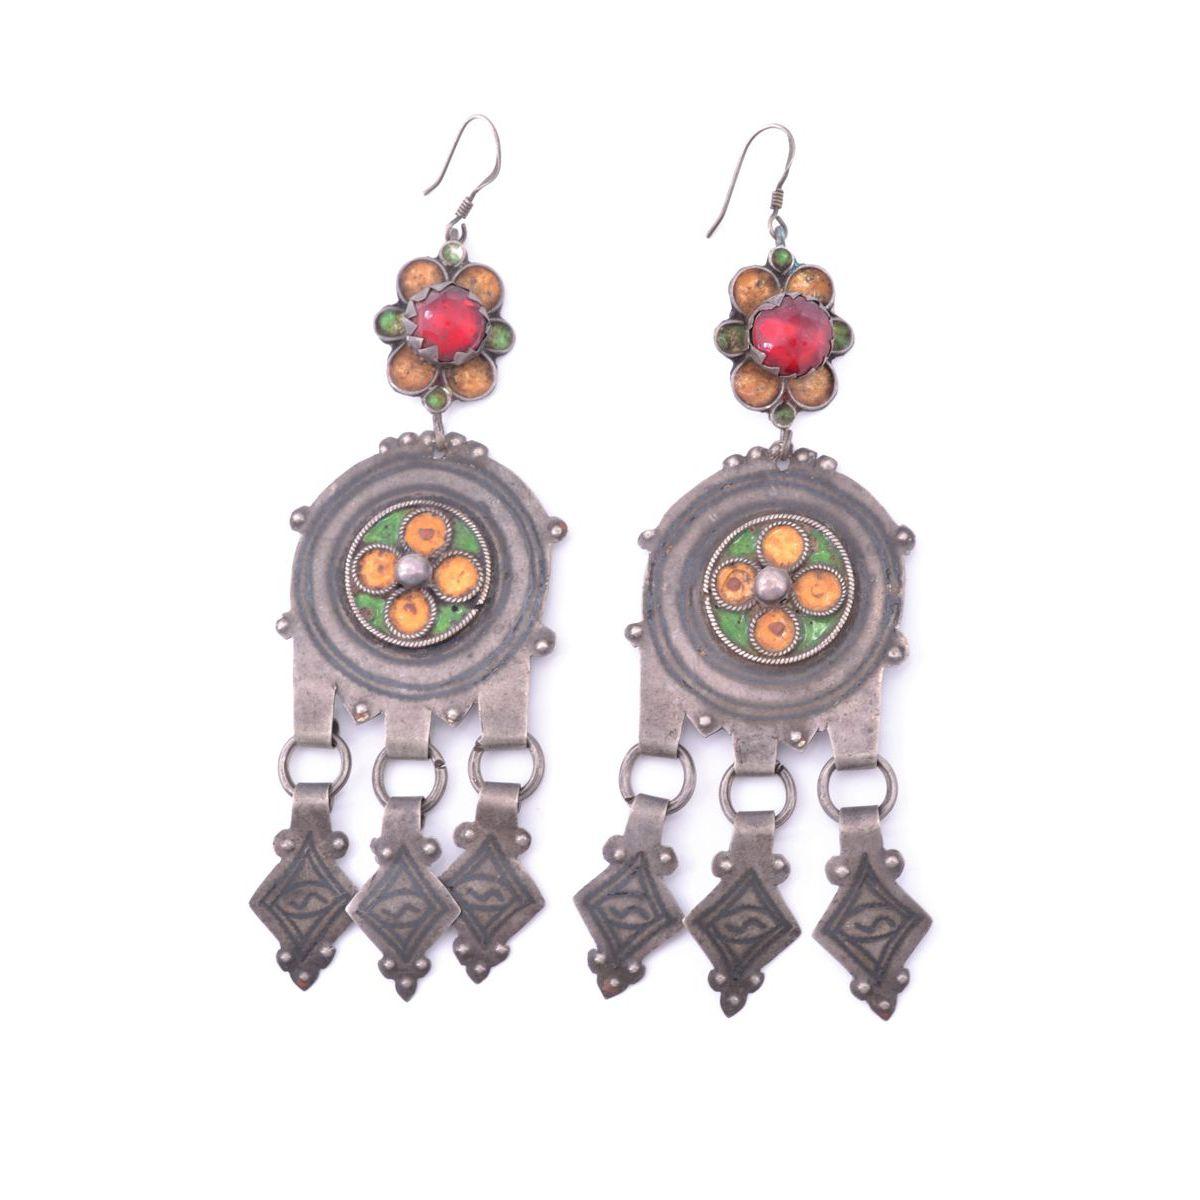 Tinzit 03 drop earrings Red BRASS Gioielli